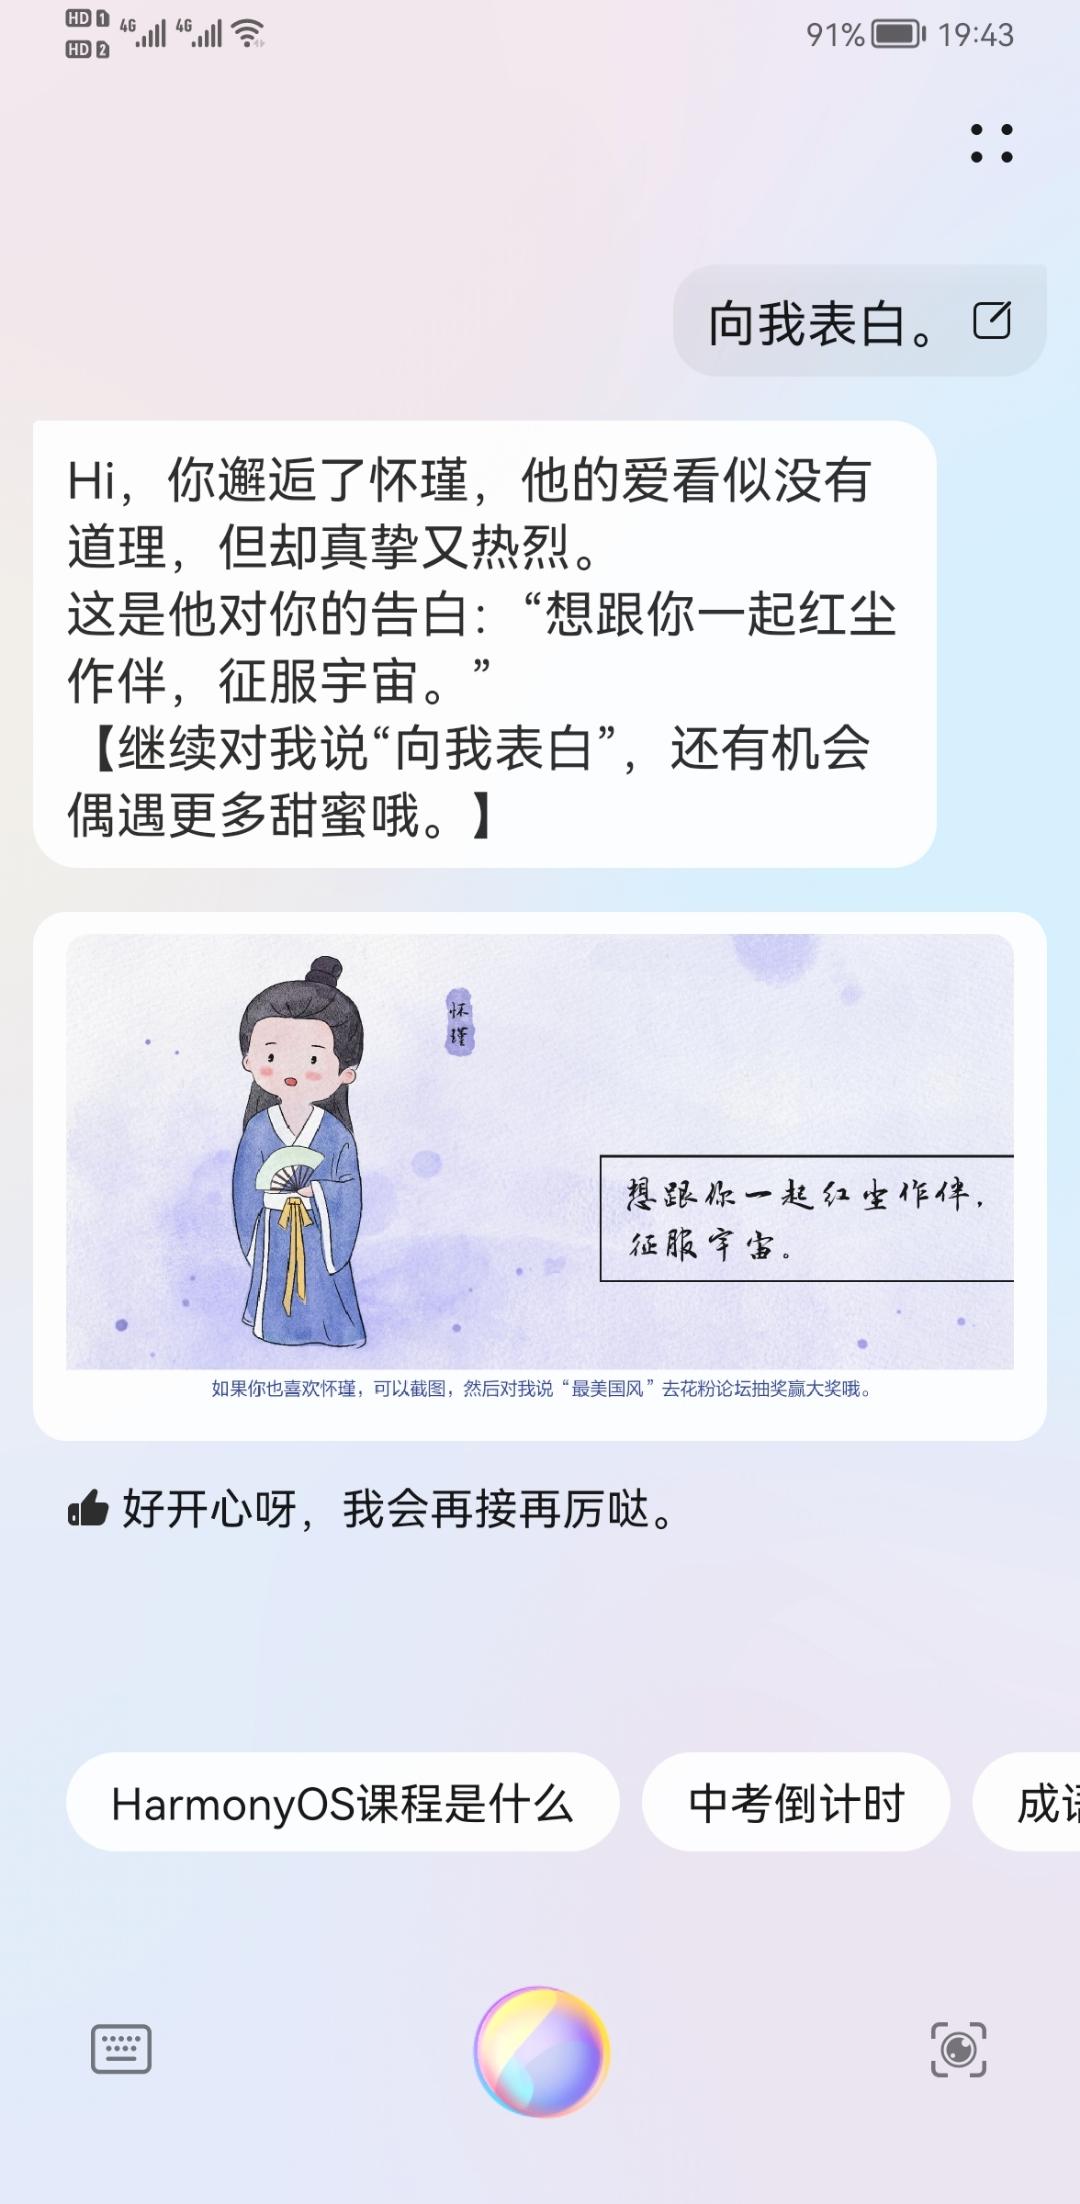 Screenshot_20210611_194338_com.huawei.vassistant.jpg